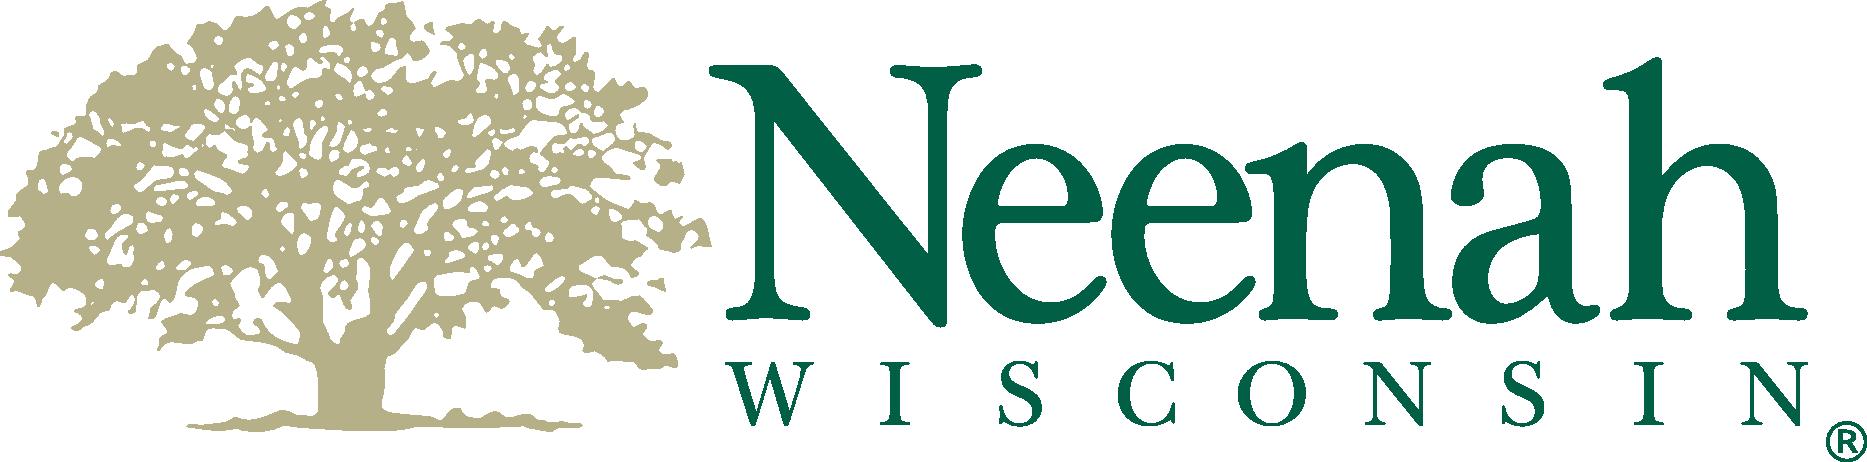 City of Neenah